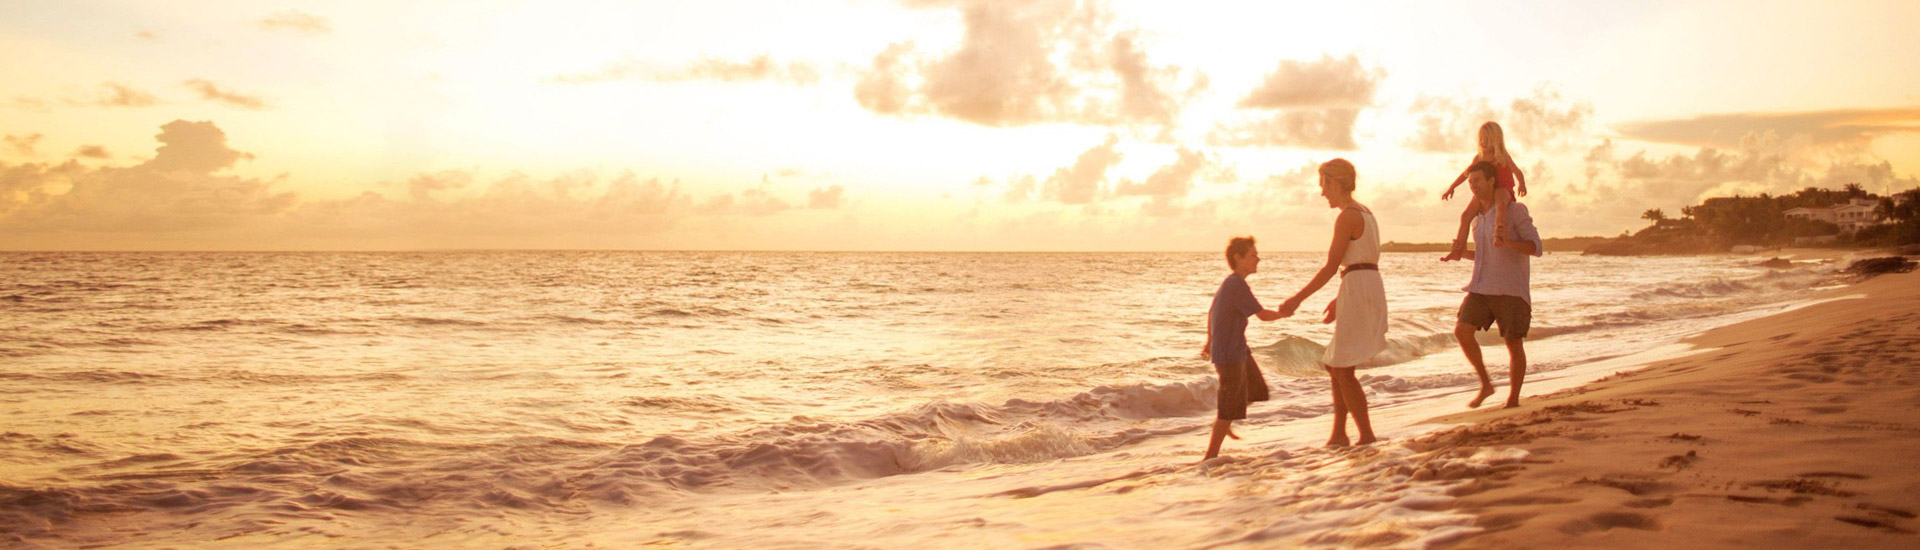 Industria-Seguros: Familia en la playa